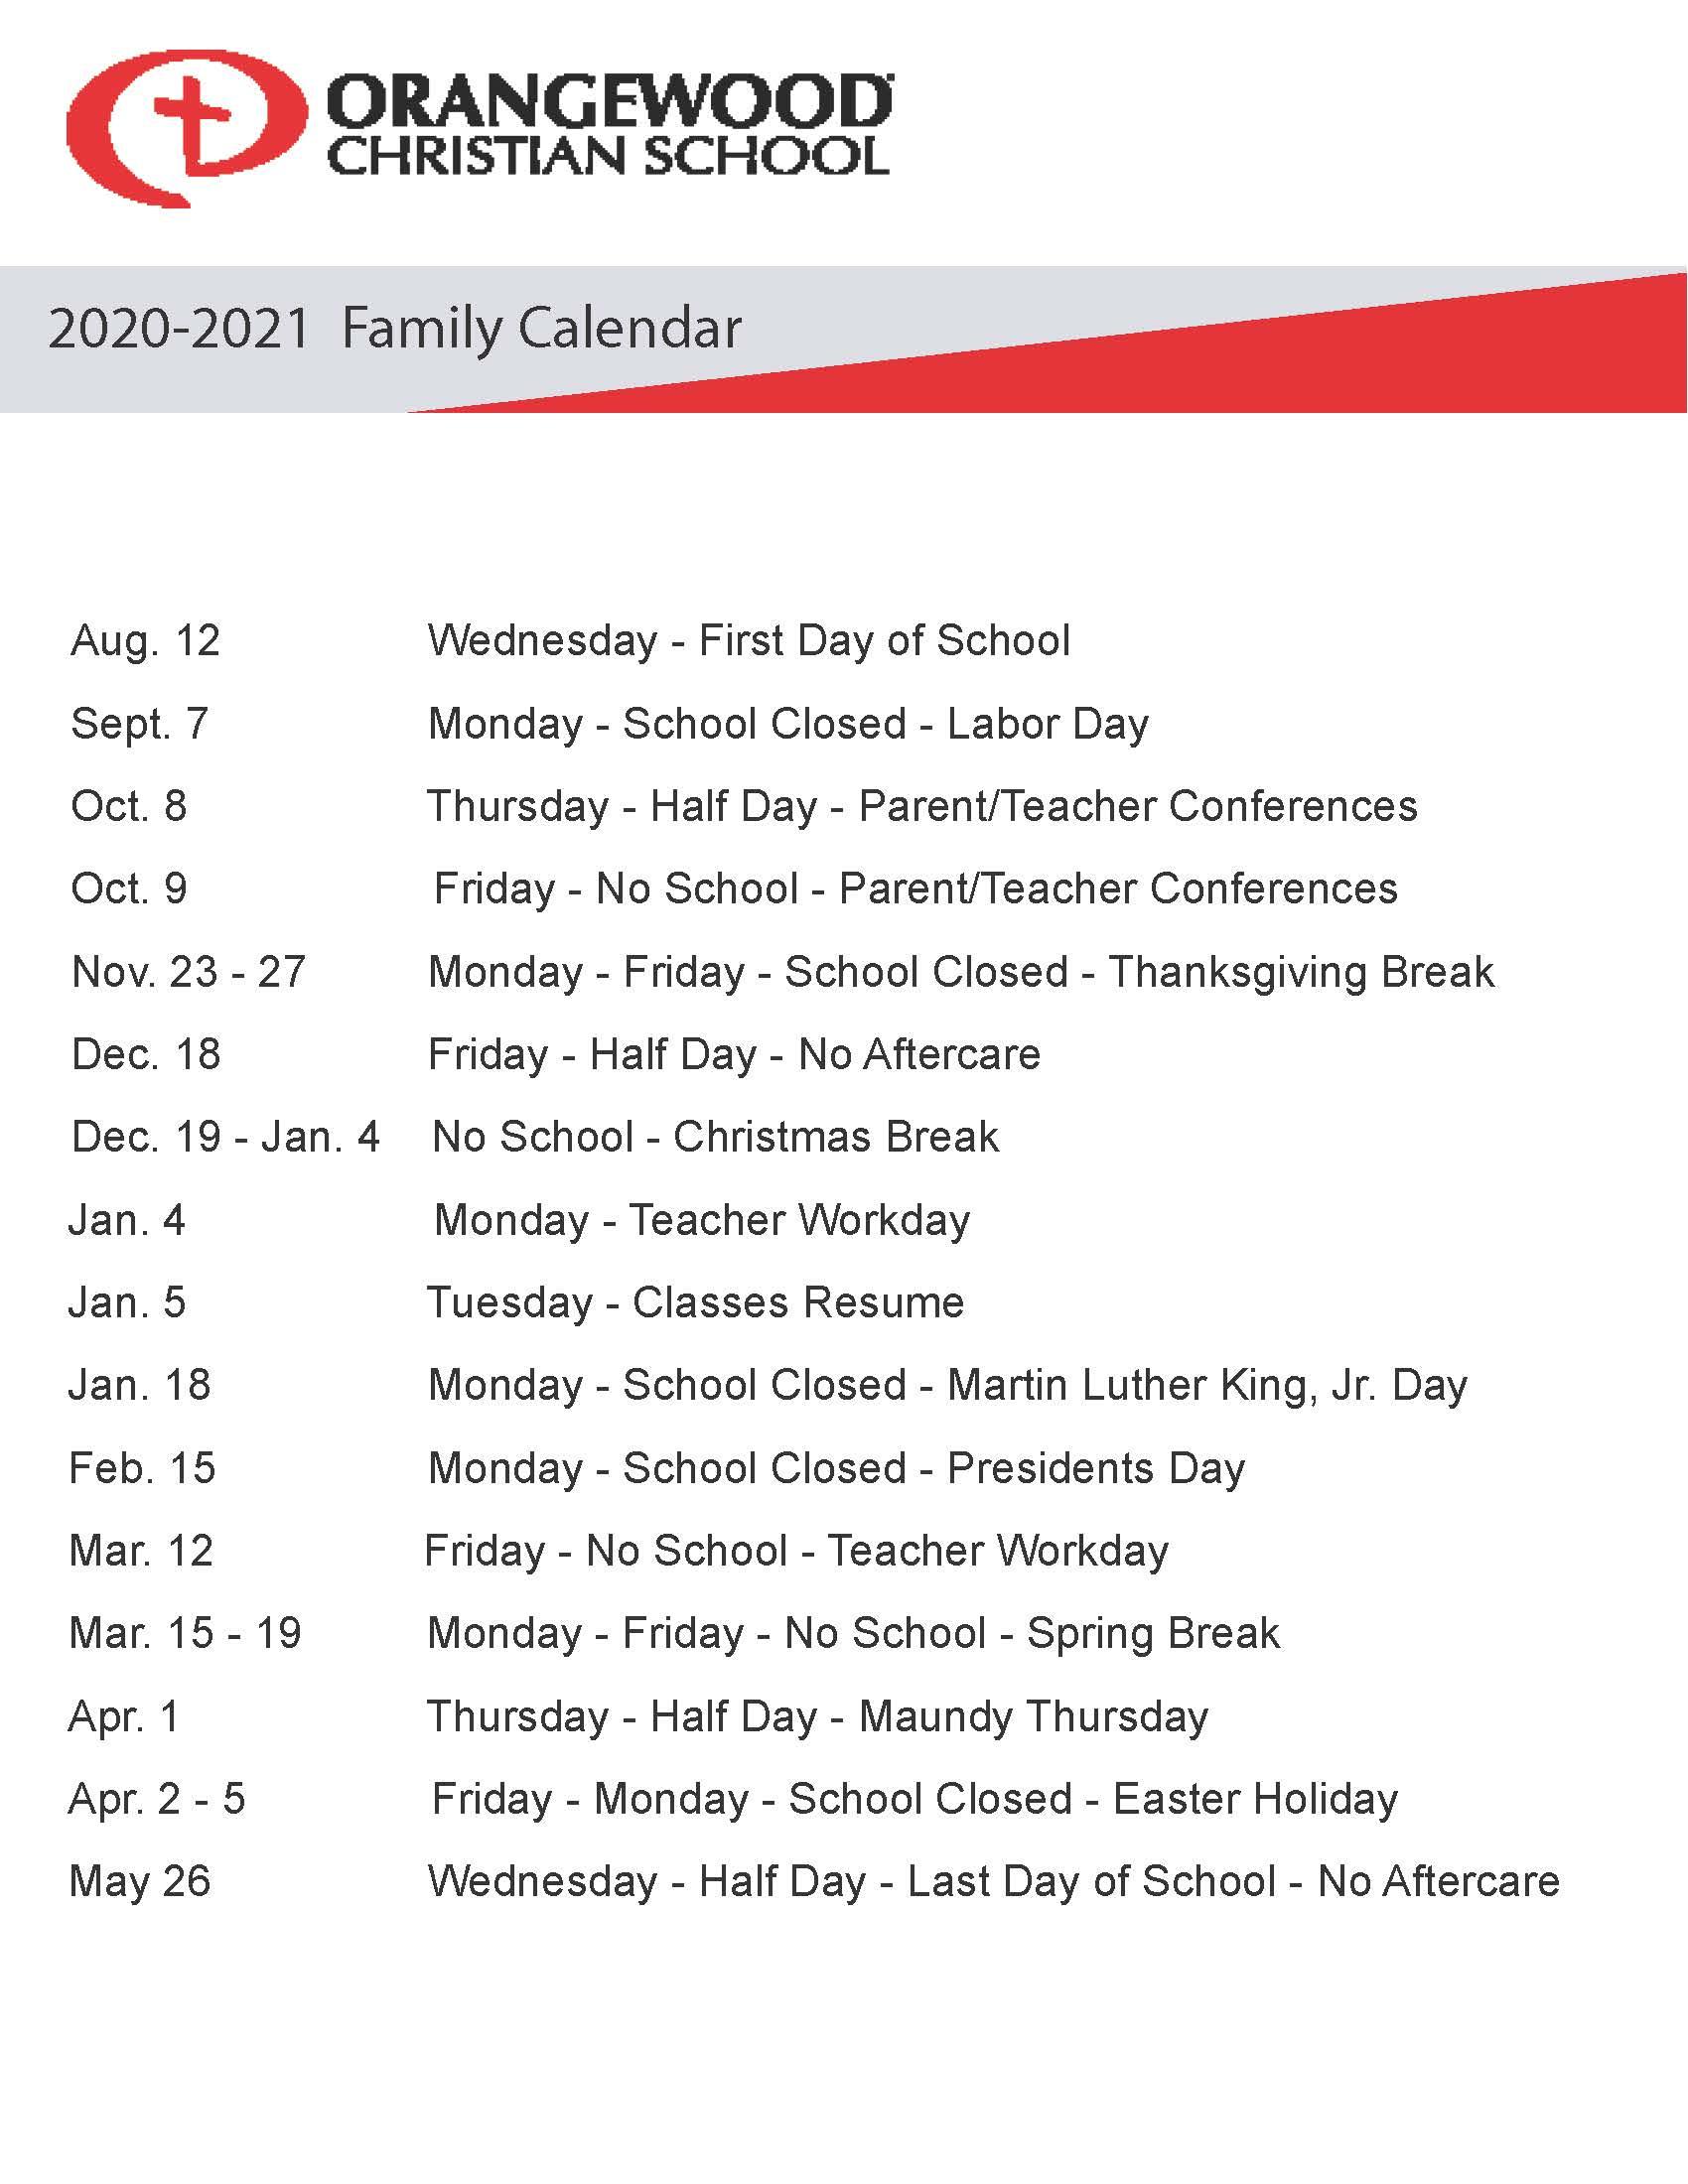 Topeka West High School Calendar | Printable Calendar 2020 Intended For Full Sail University Academic Calendar 2022